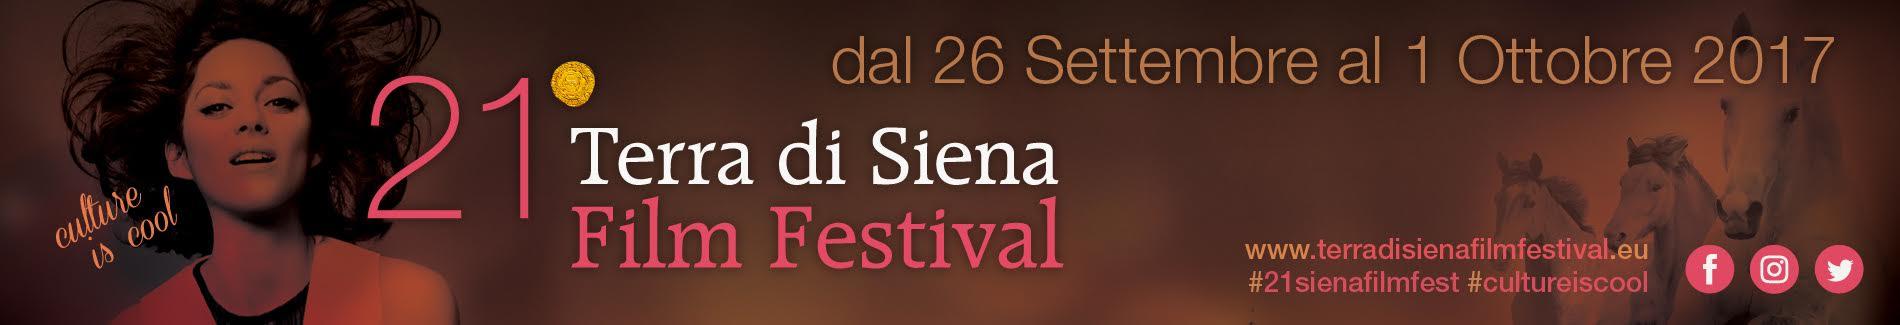 Terra Di Siena Film Festival-Banner